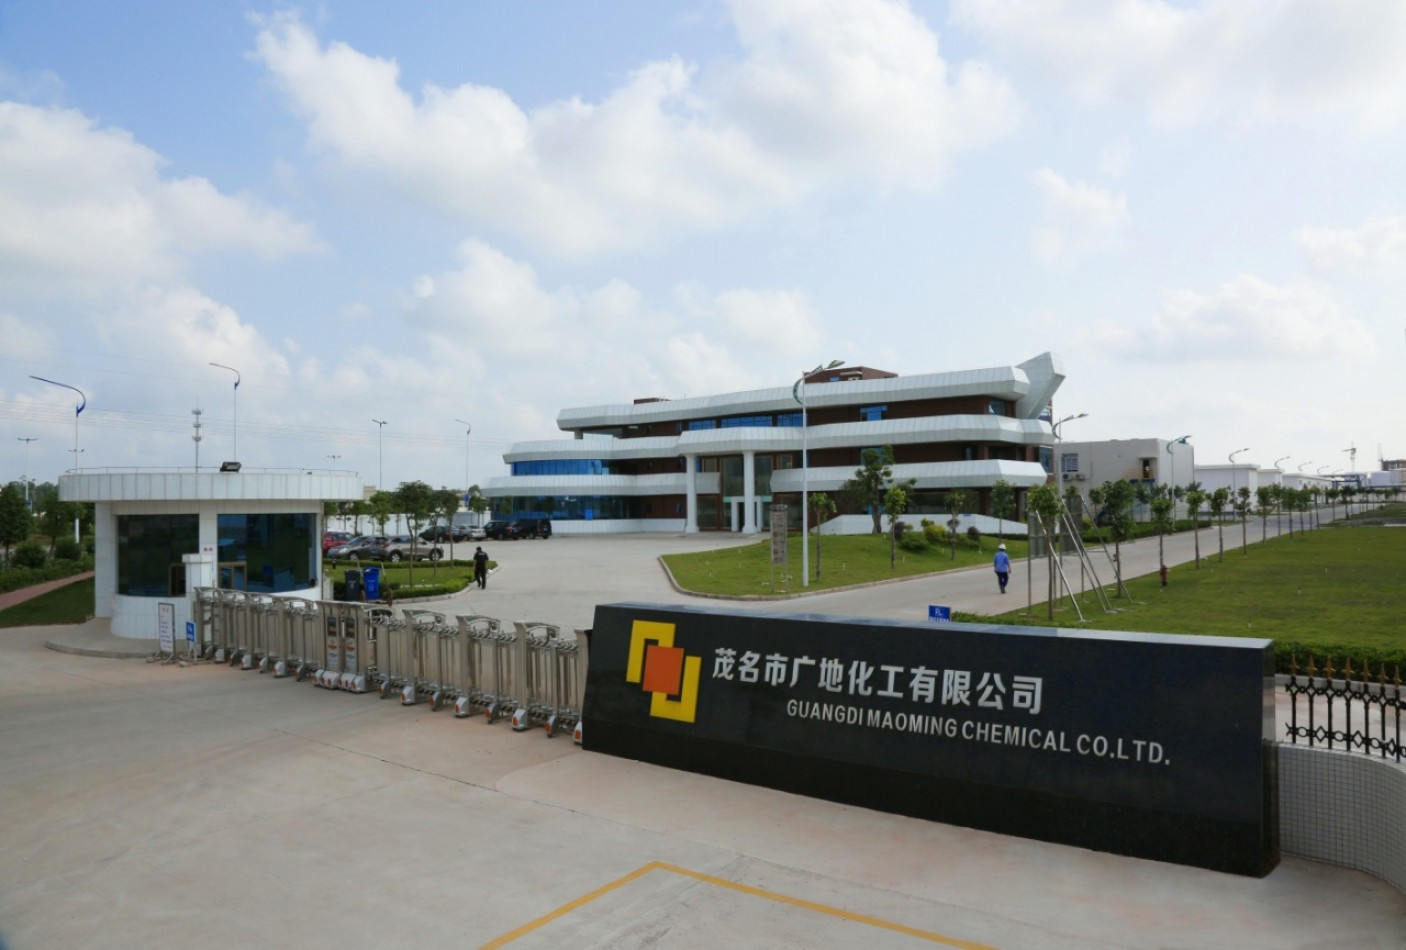 Guangdi Maoming Chemical Co., Ltd.